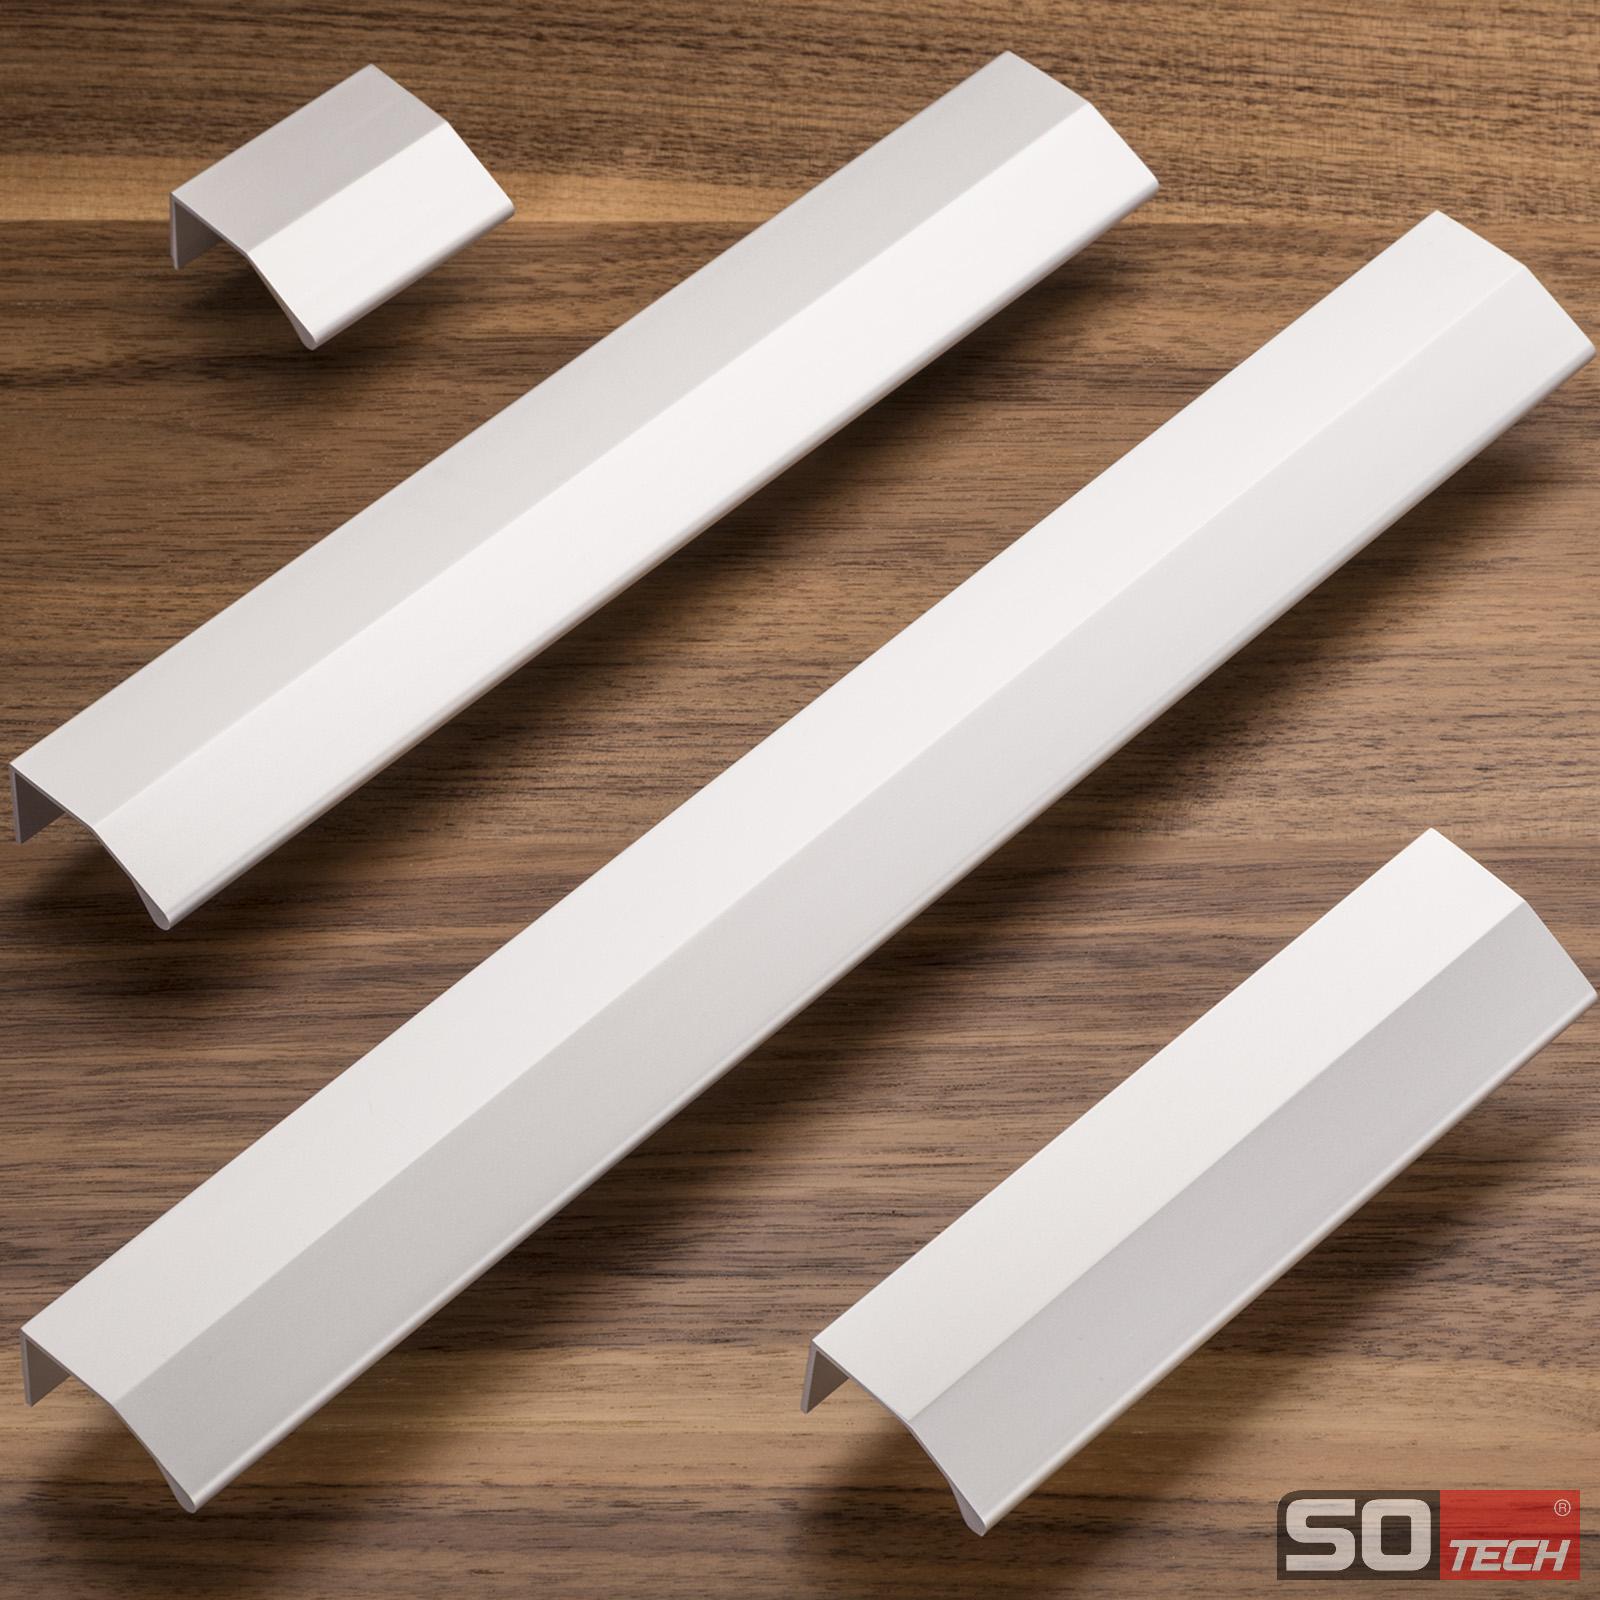 SO-TECH/® G6 Stangengriff M/öbelgriff Echt Edelstahl BA 192 mm /Ø 12 mm